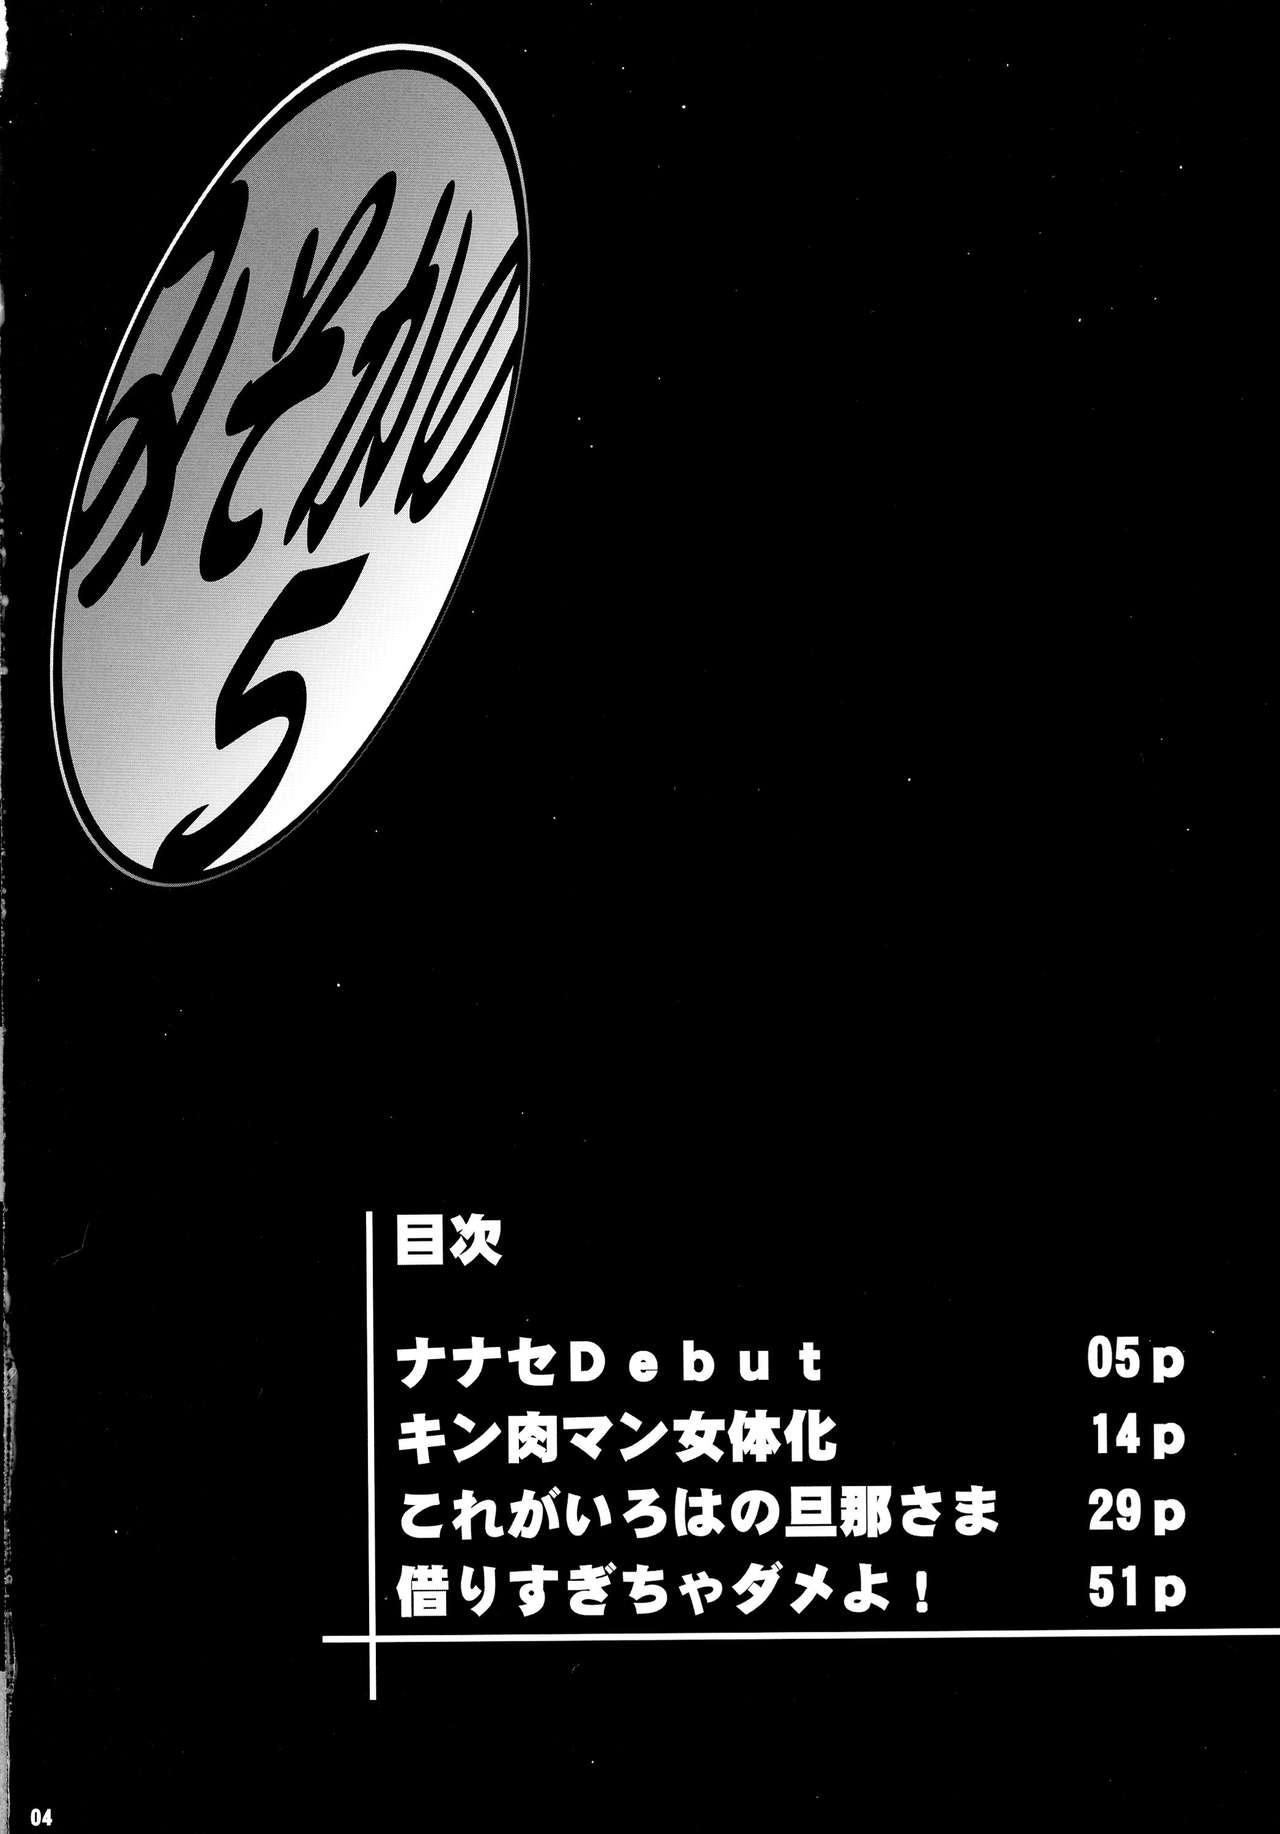 Misoka no 5 3